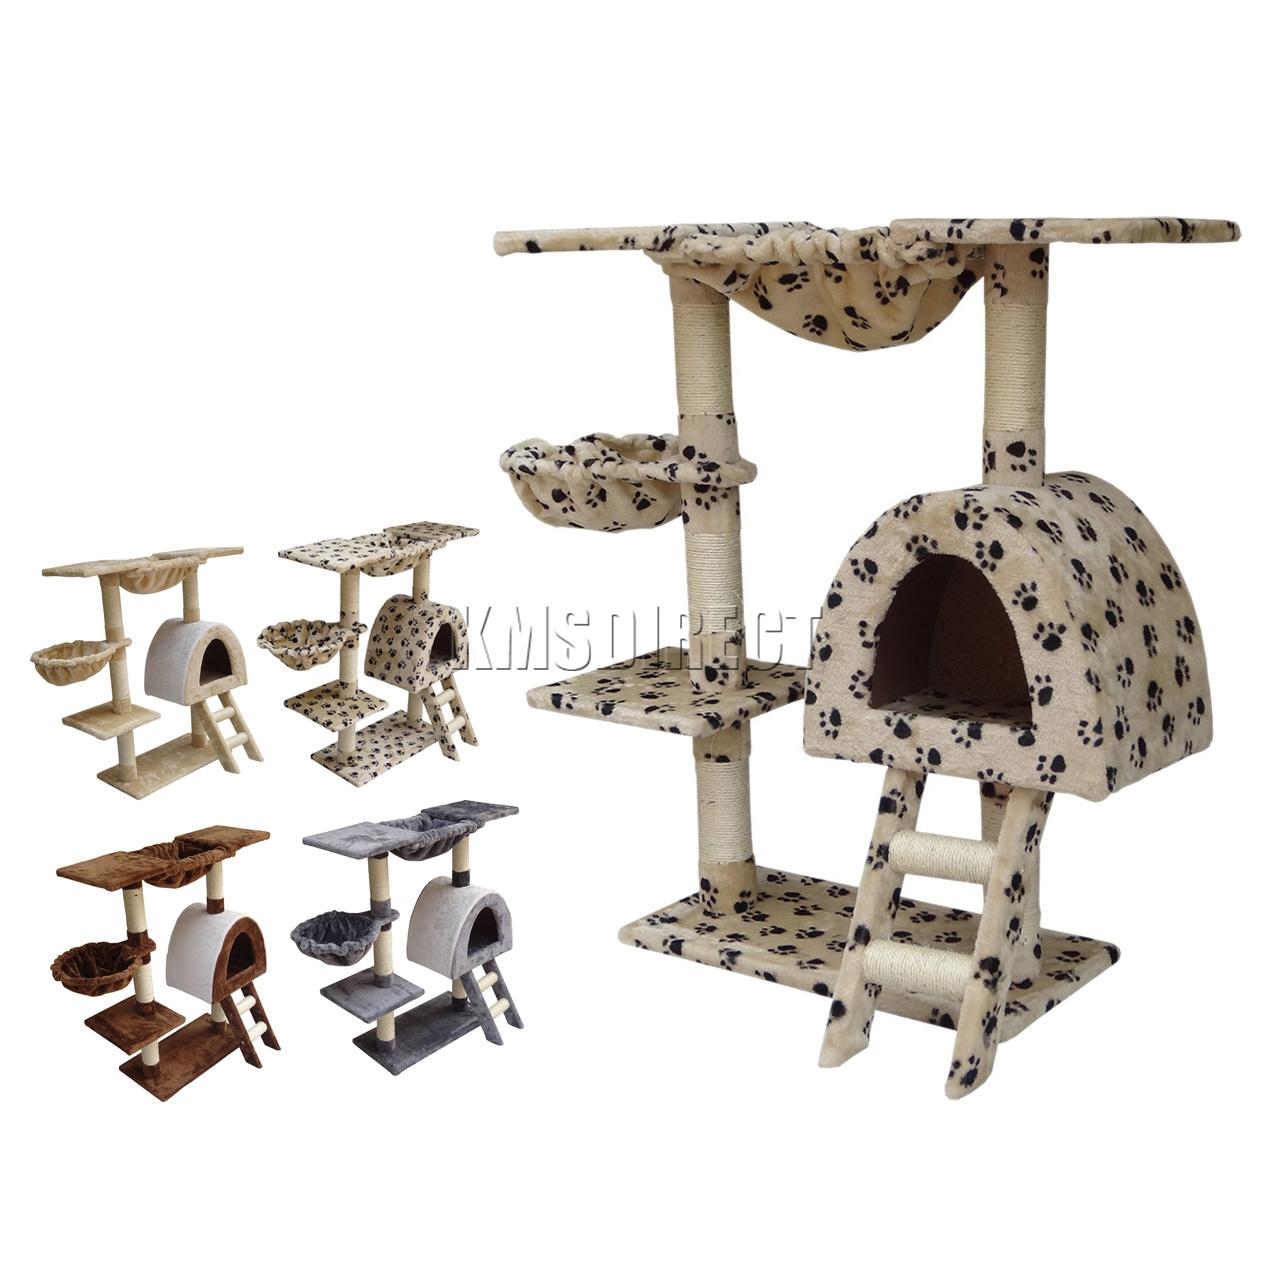 Foxhunter cat kitten post tree scratcher bed activity centre sisal climbing toy ebay - Cat bed scratcher ...